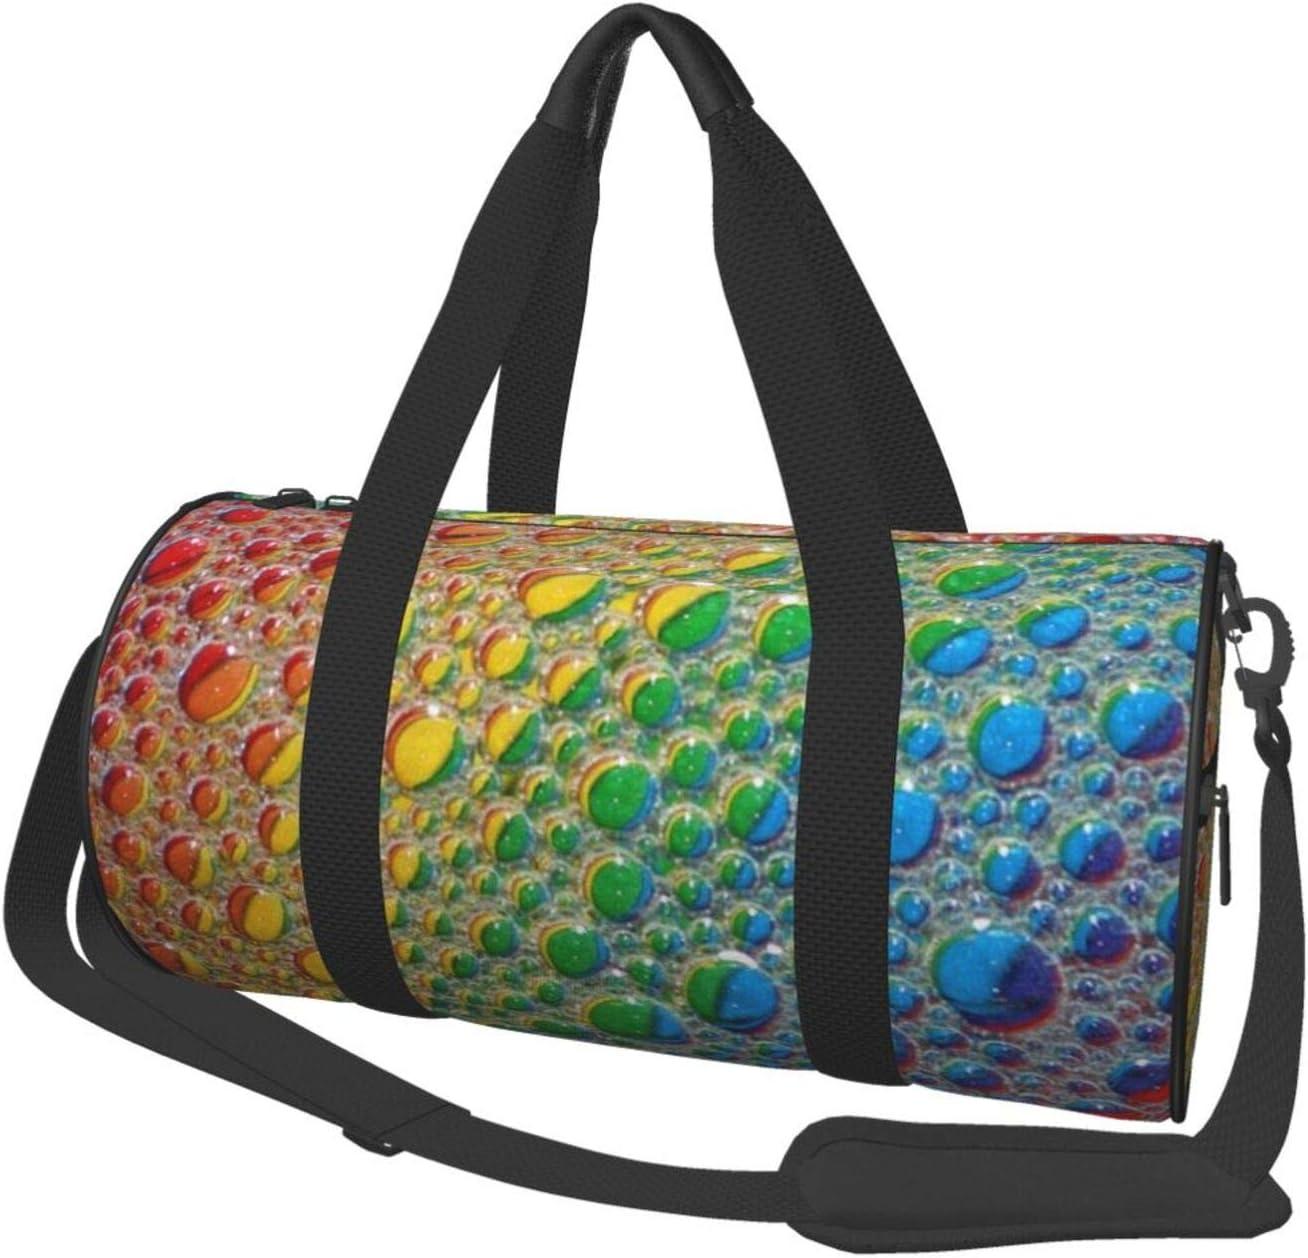 Round Sports Gym Ranking TOP10 Bag Rainbow Los Angeles Mall Handbag Water Droplets Yoga Sho